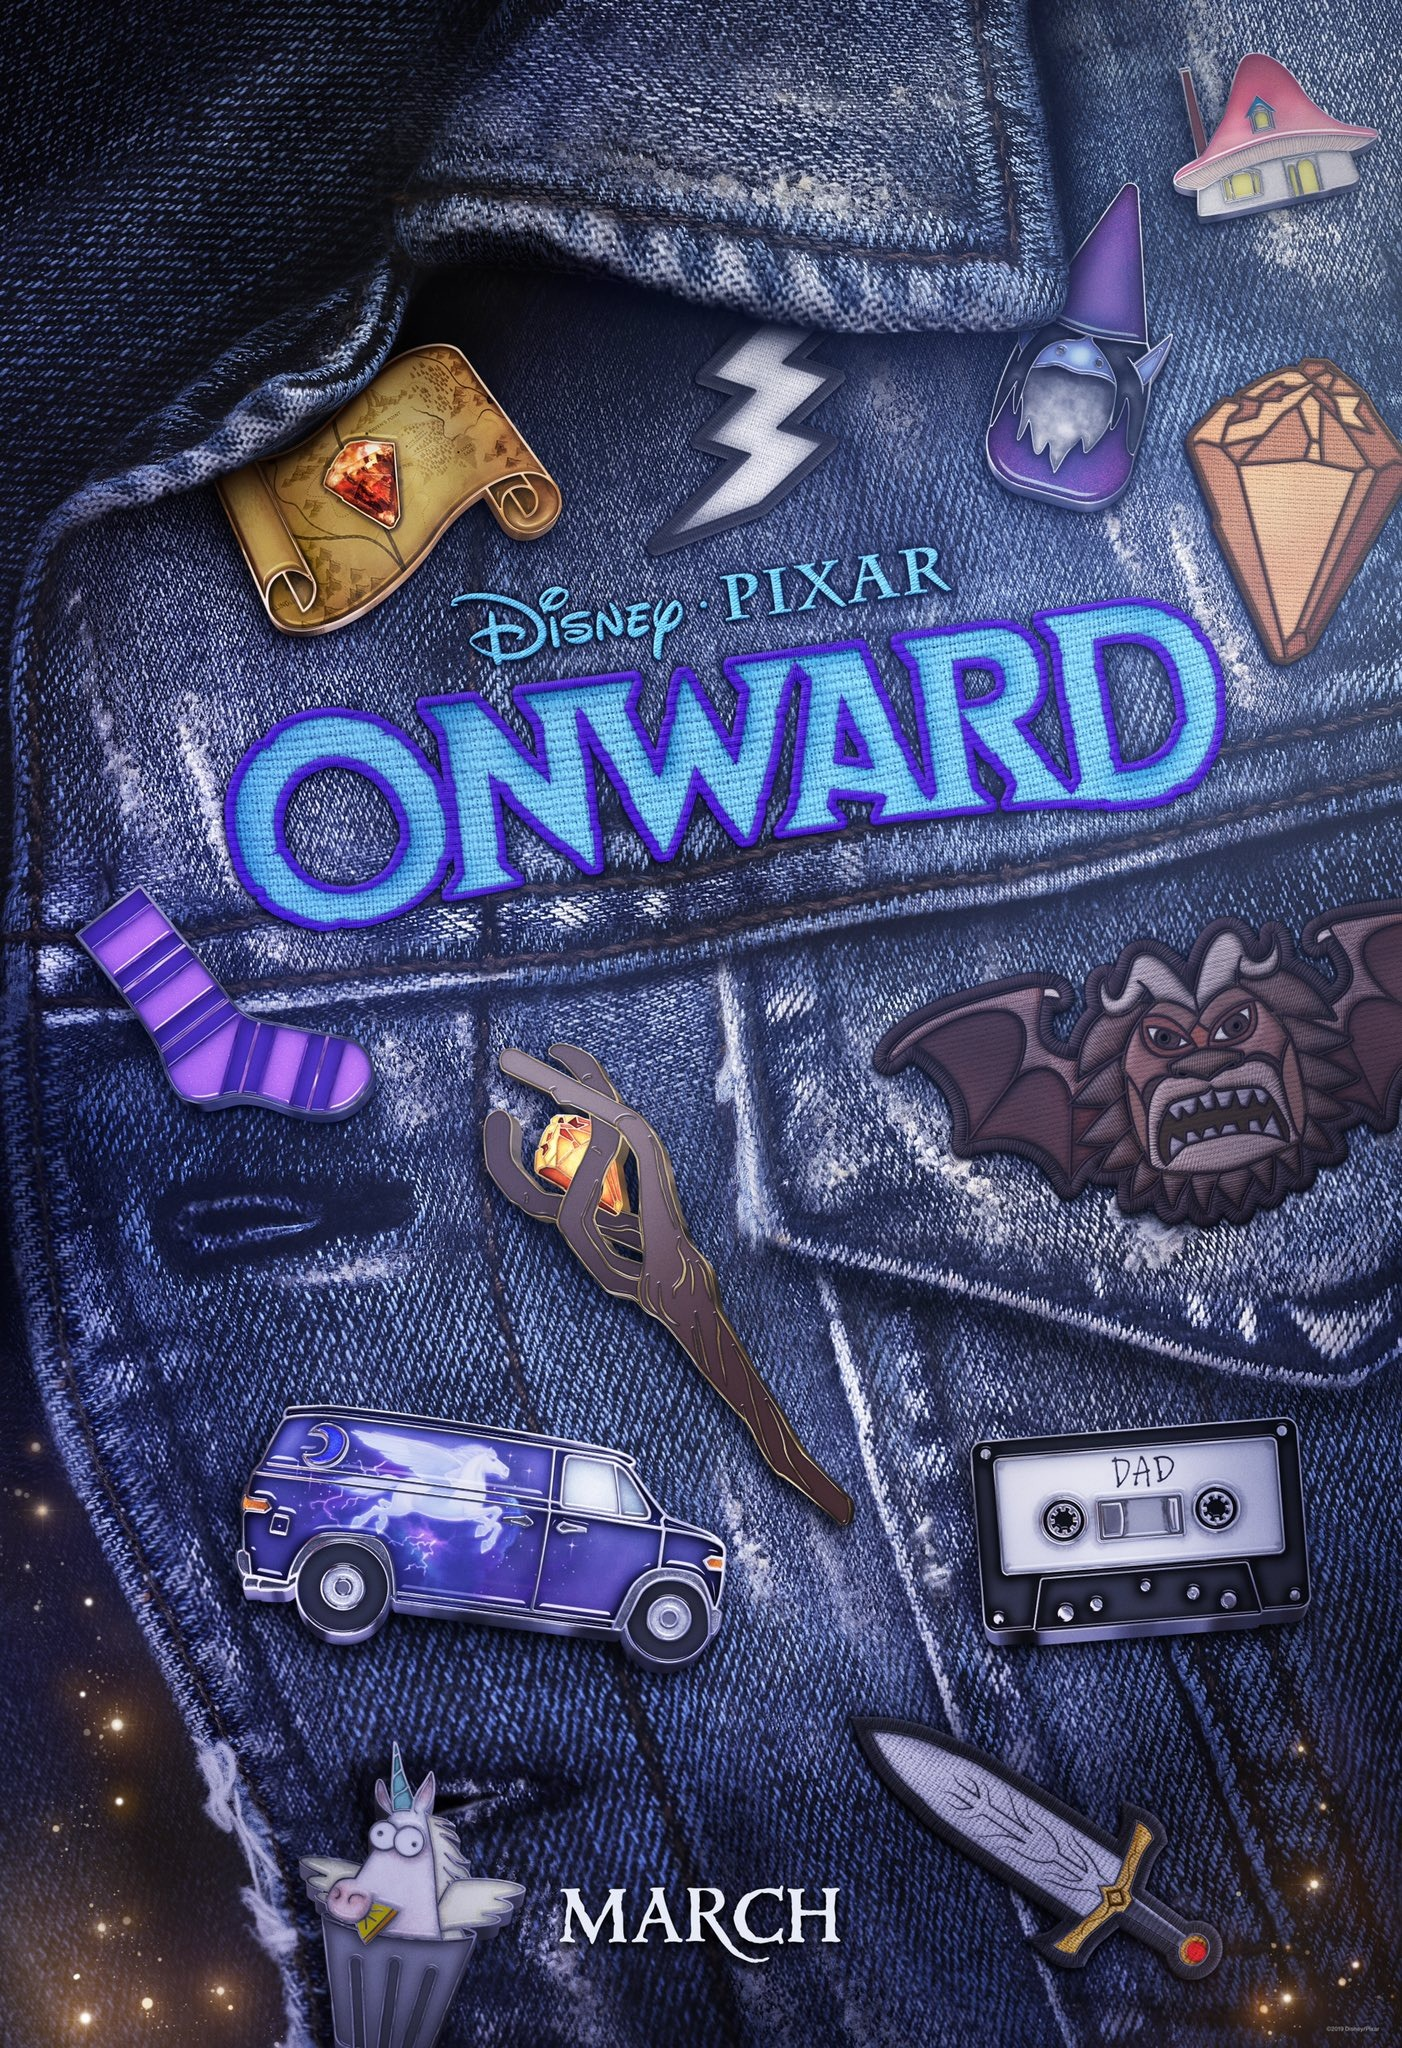 szmk_onward_elore_pixar_disney_animaacos_film_12.jpg